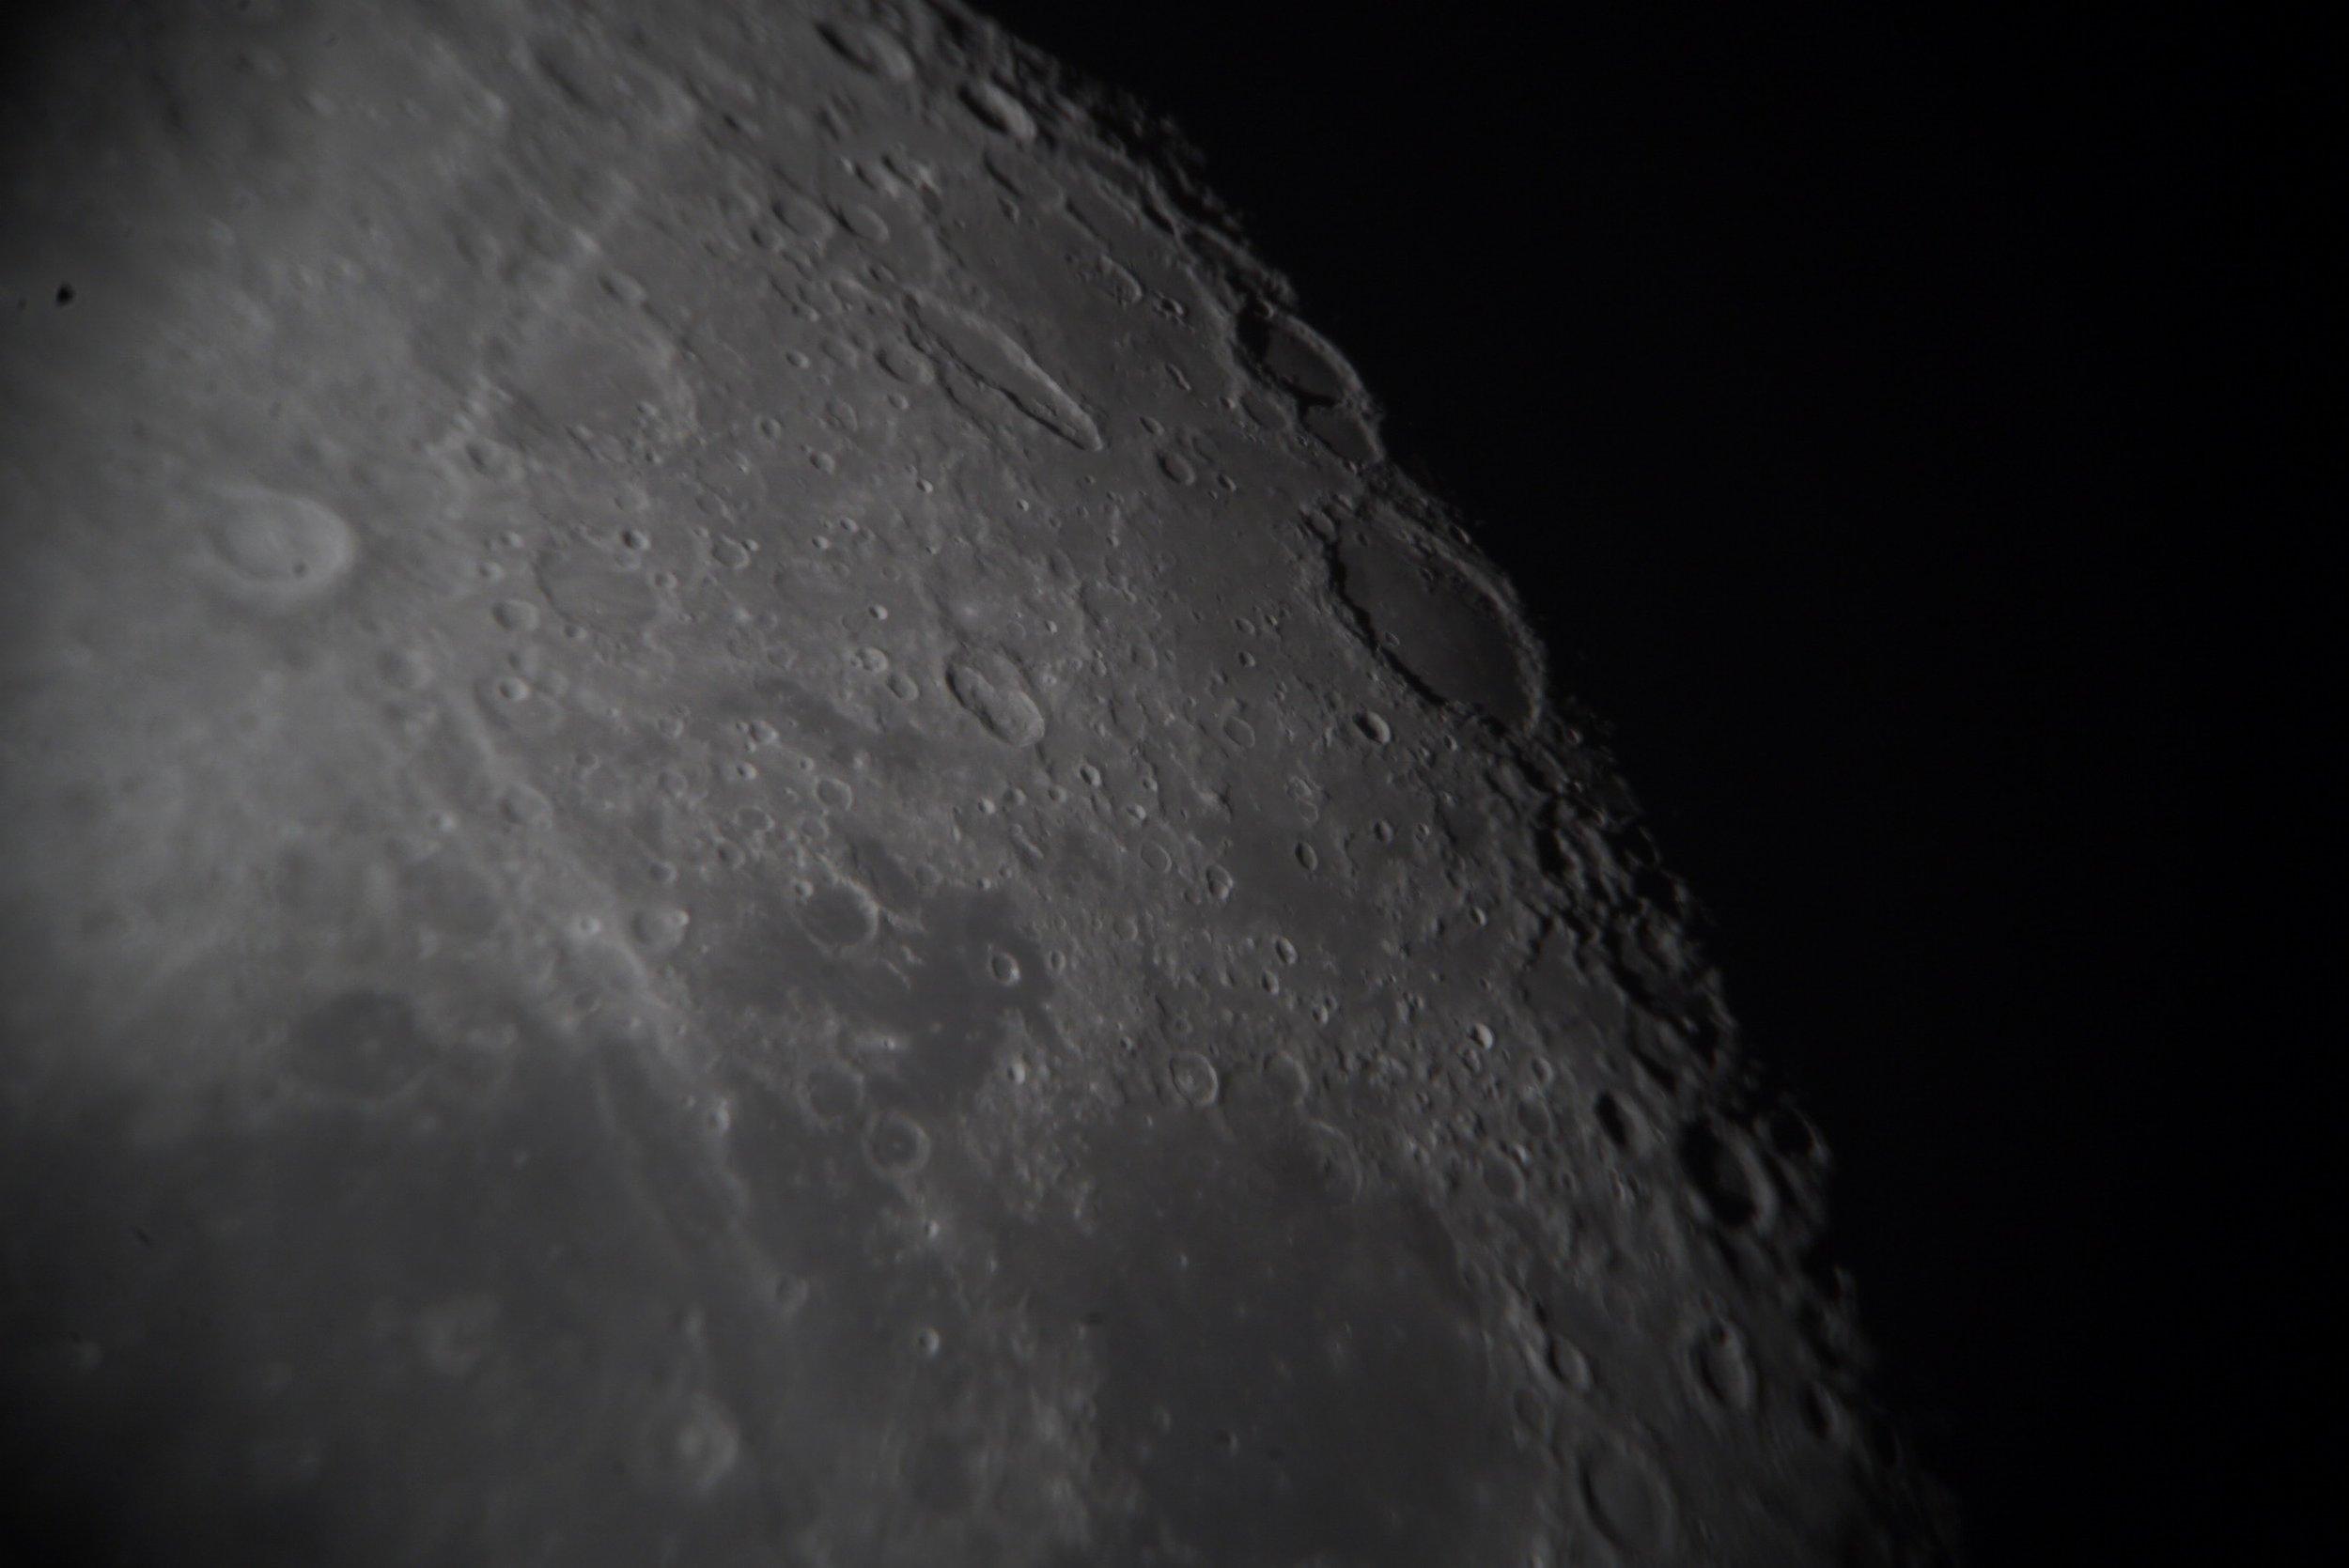 terrain of the moon.jpg